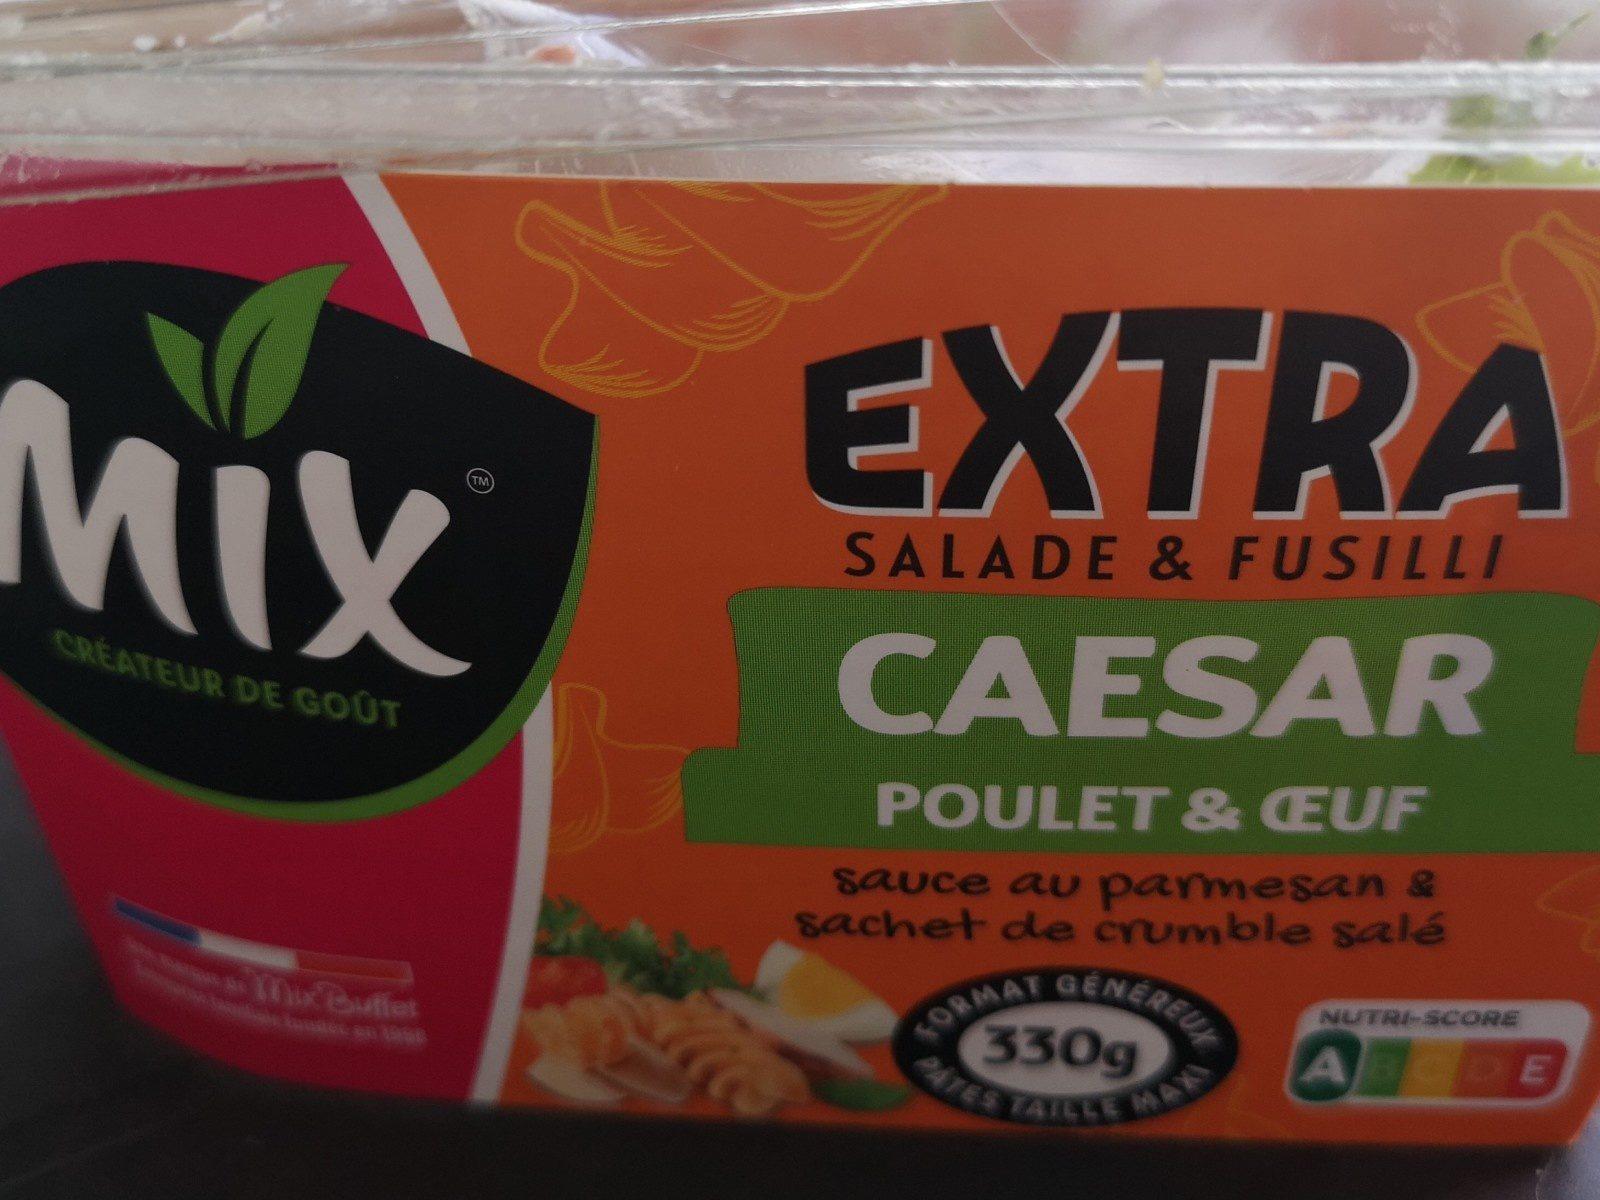 EXTRA Salade & Fusilli Caesar Poulet et Oeuf, 330g - Ingrédients - fr